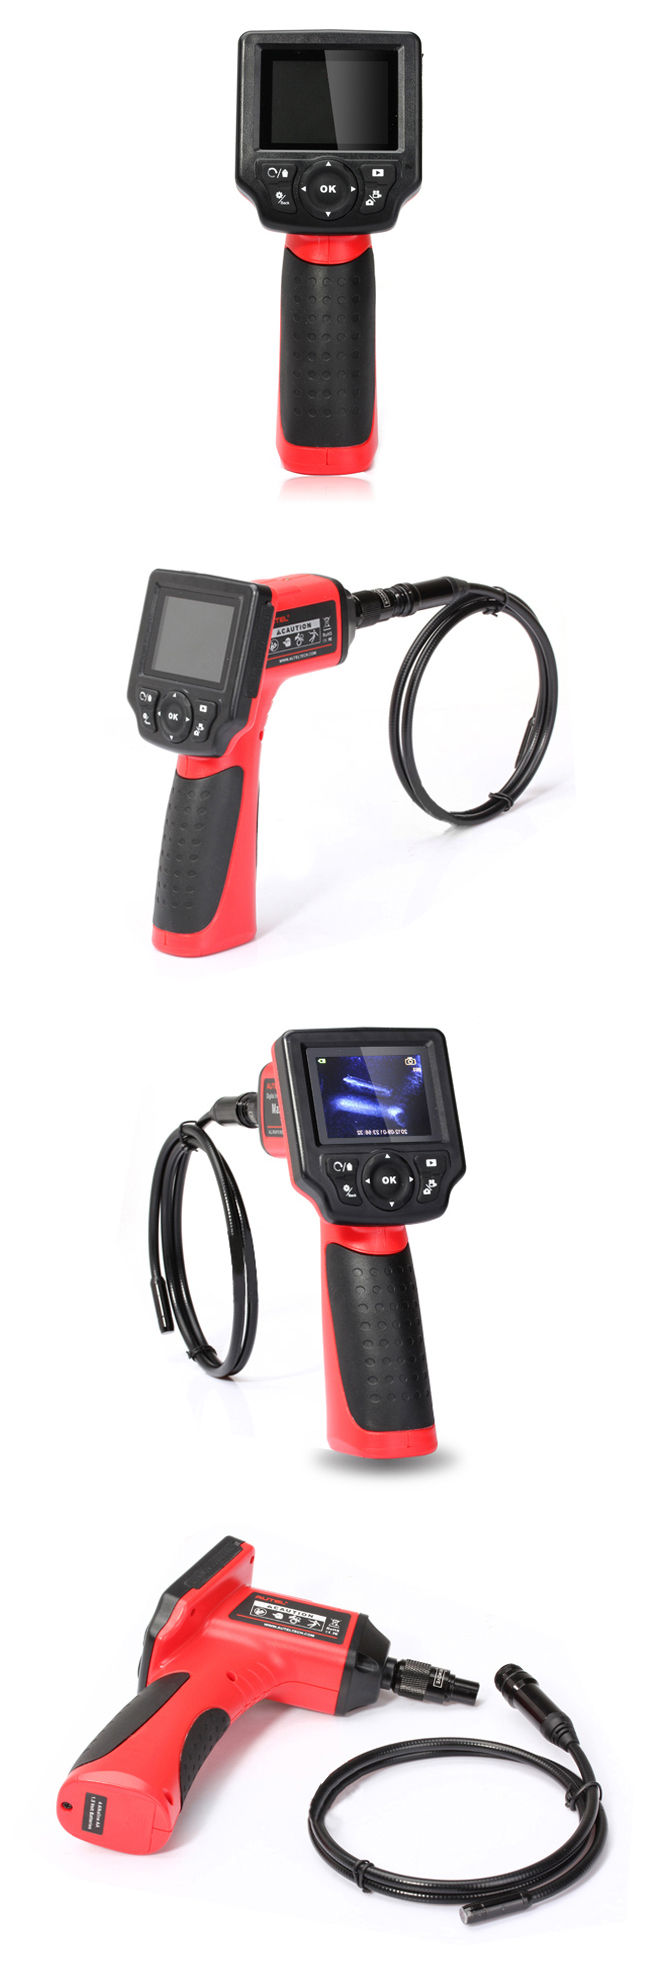 Autel Maxivideo MV208 Interface